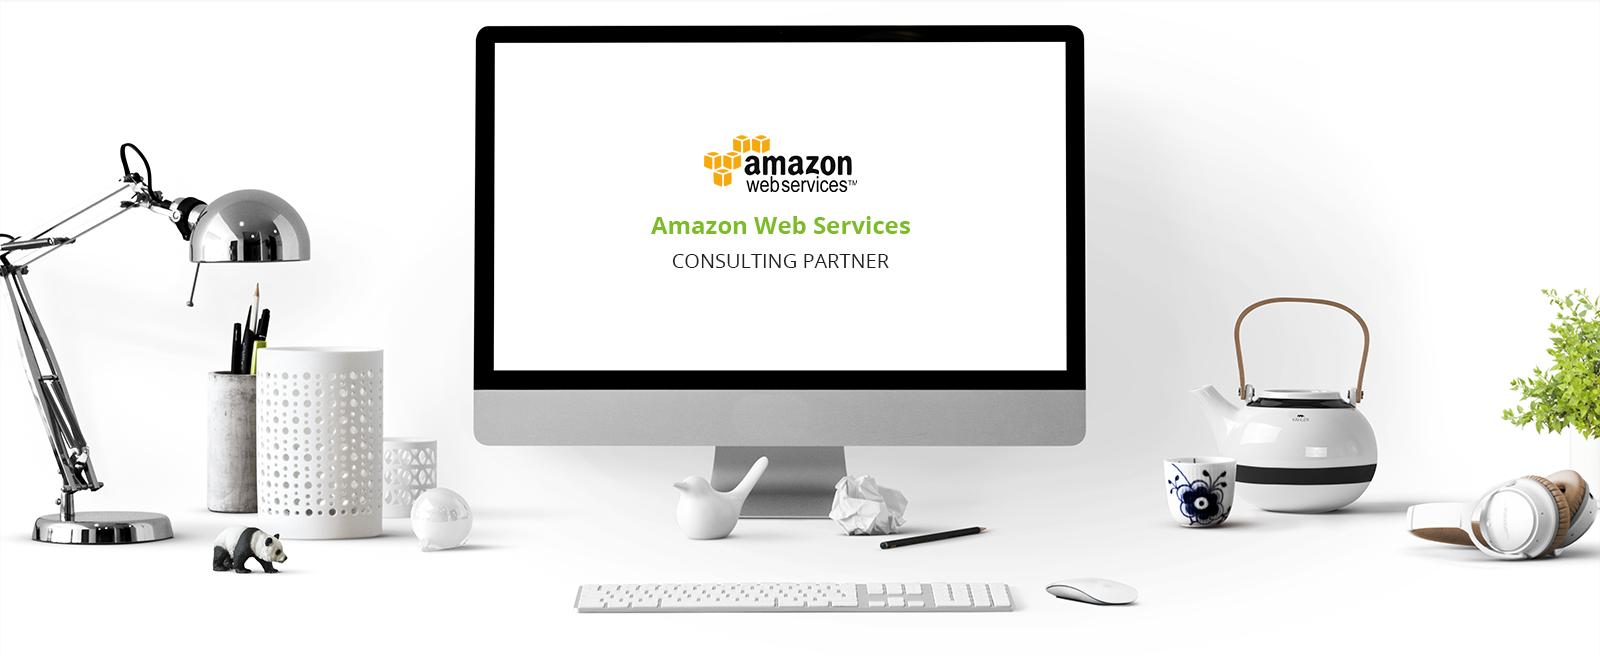 home-slider-tekzee-technologies-indore-amazon-web-services